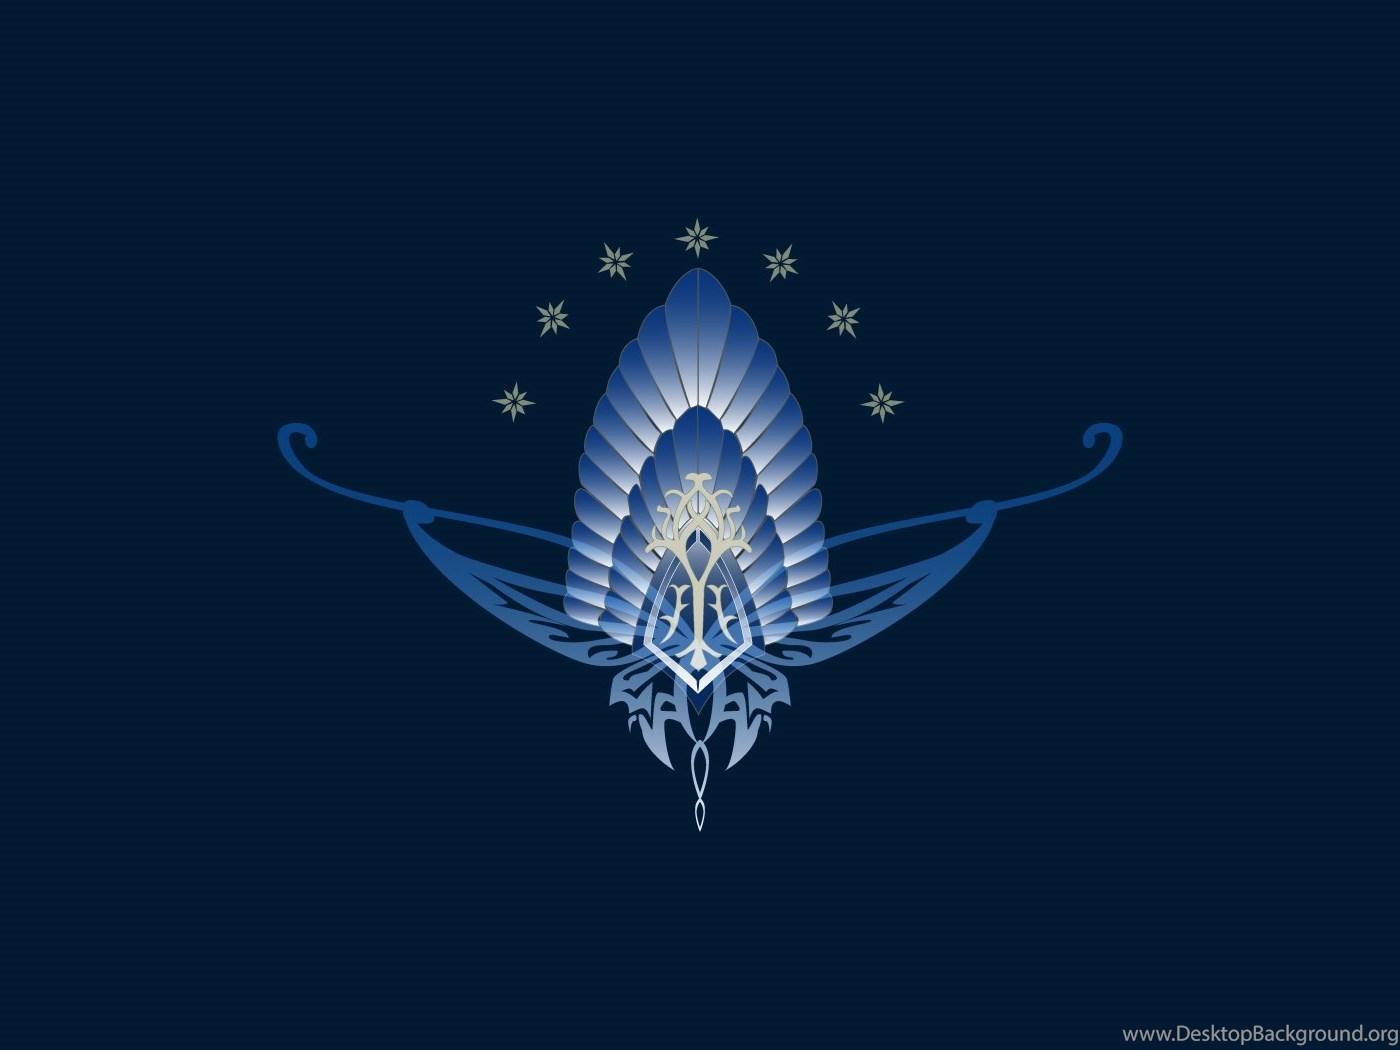 White Tree Of Gondor By Ghanimacore On Deviantart Desktop Background